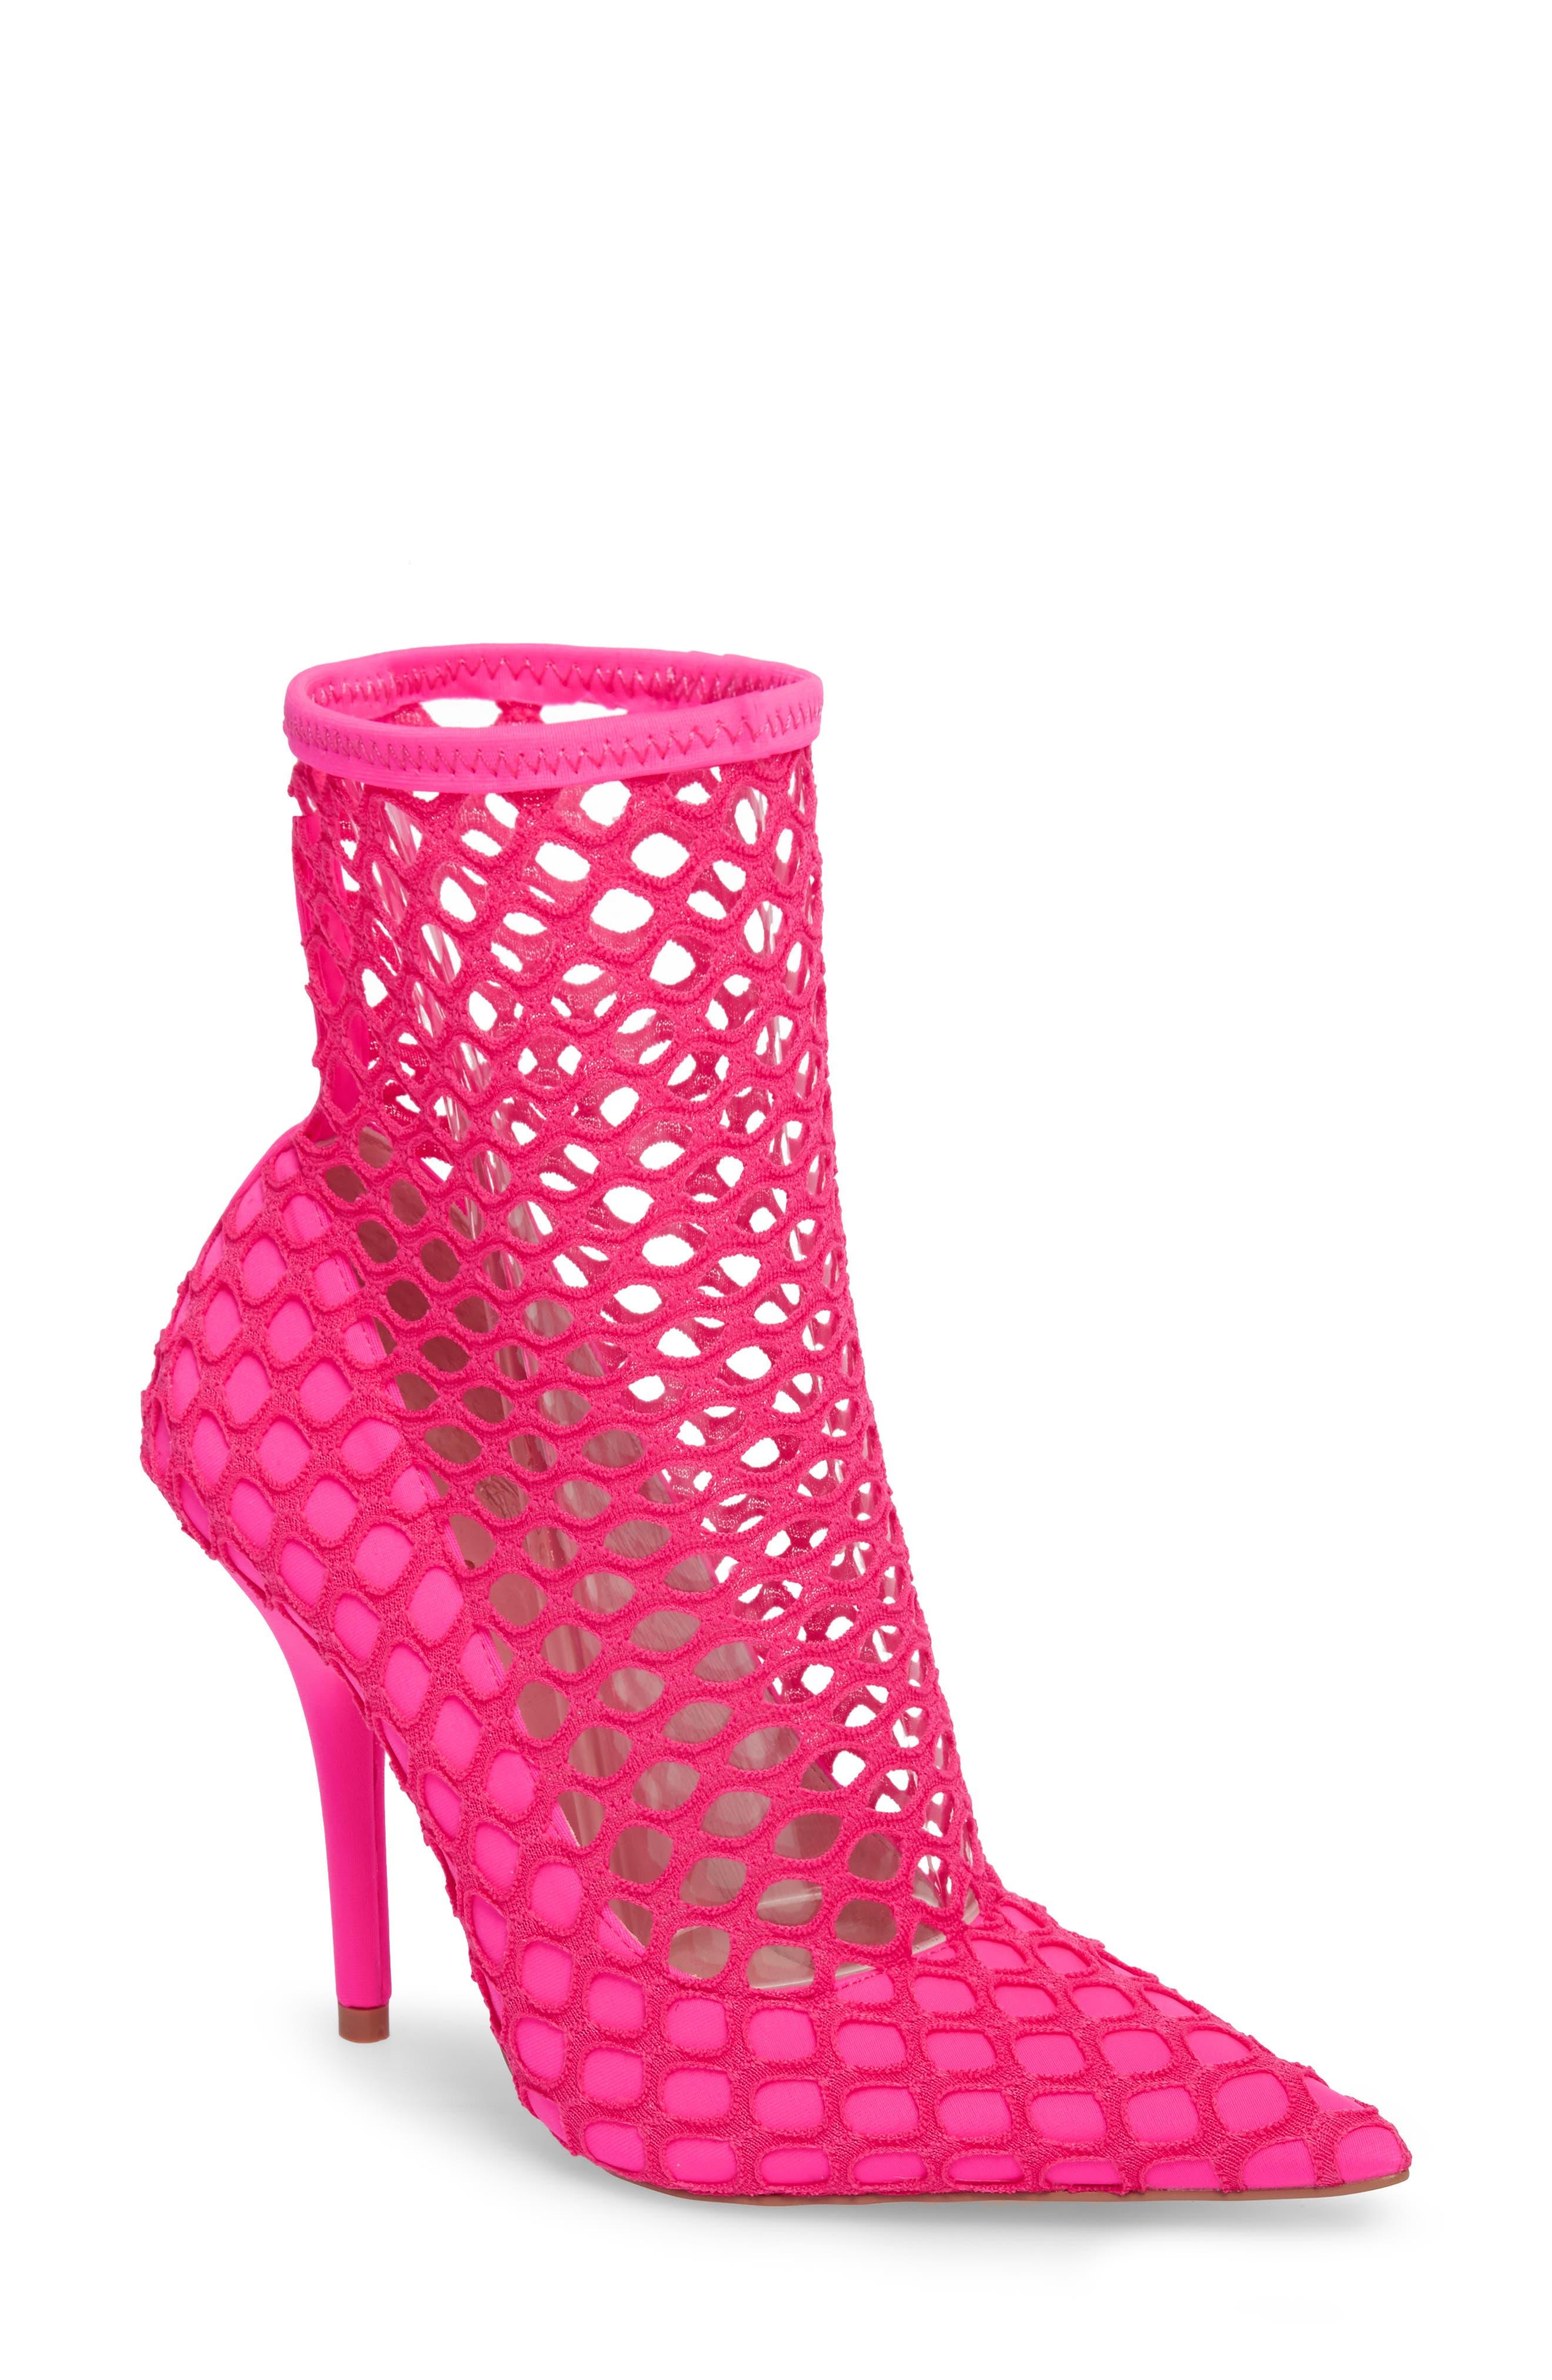 Heidi Mesh Sock Bootie,                             Main thumbnail 1, color,                             Neon Pink Fabric